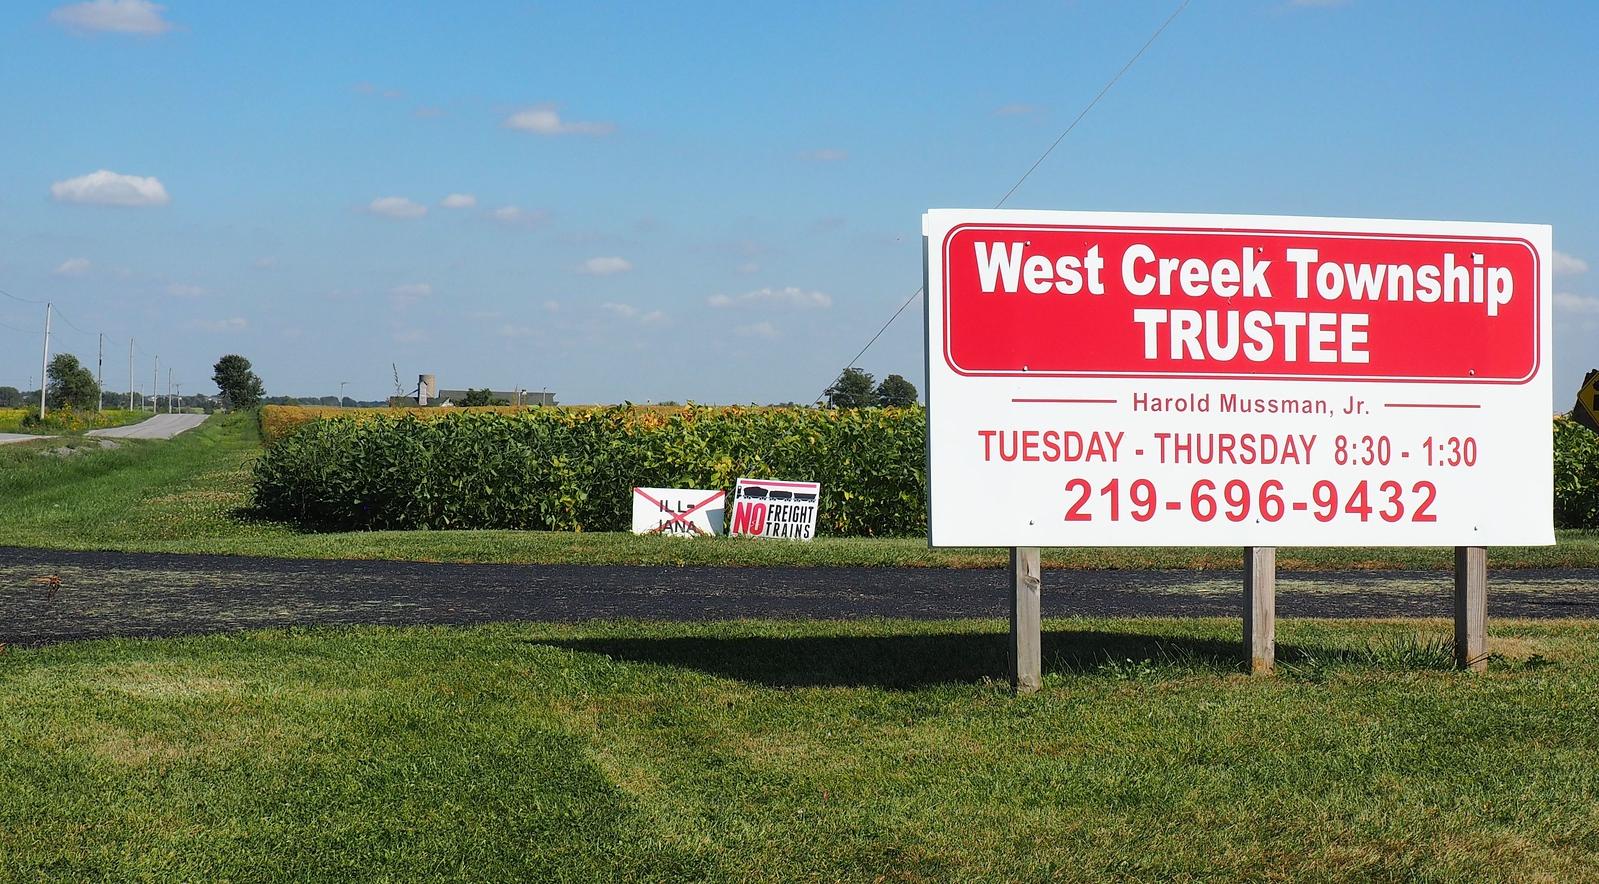 West Creek Township Trustee